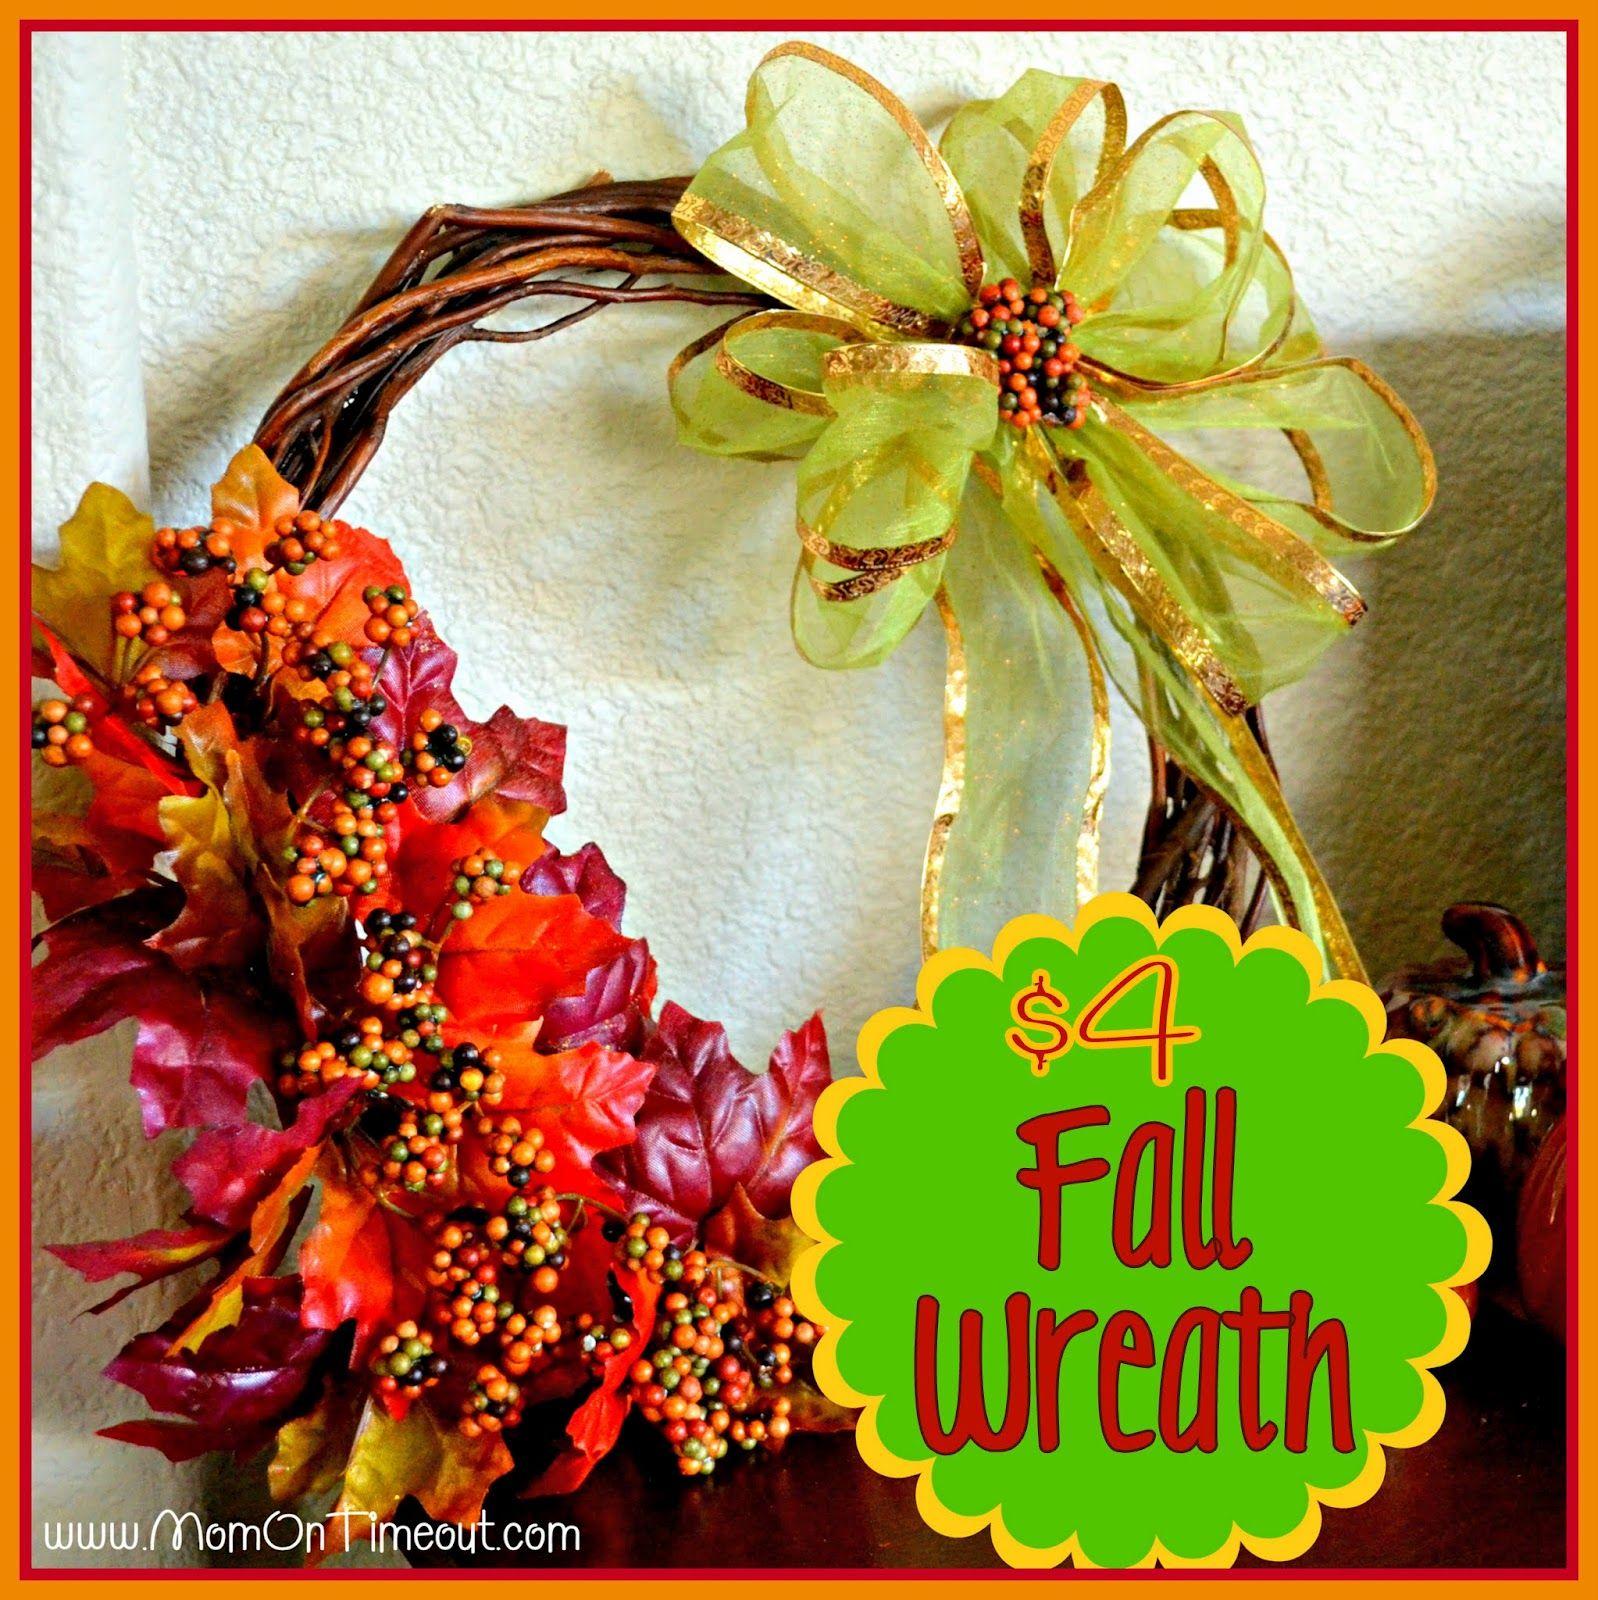 Mom On Timeout: $4 Fall Wreath {Dollar Tree Craft}